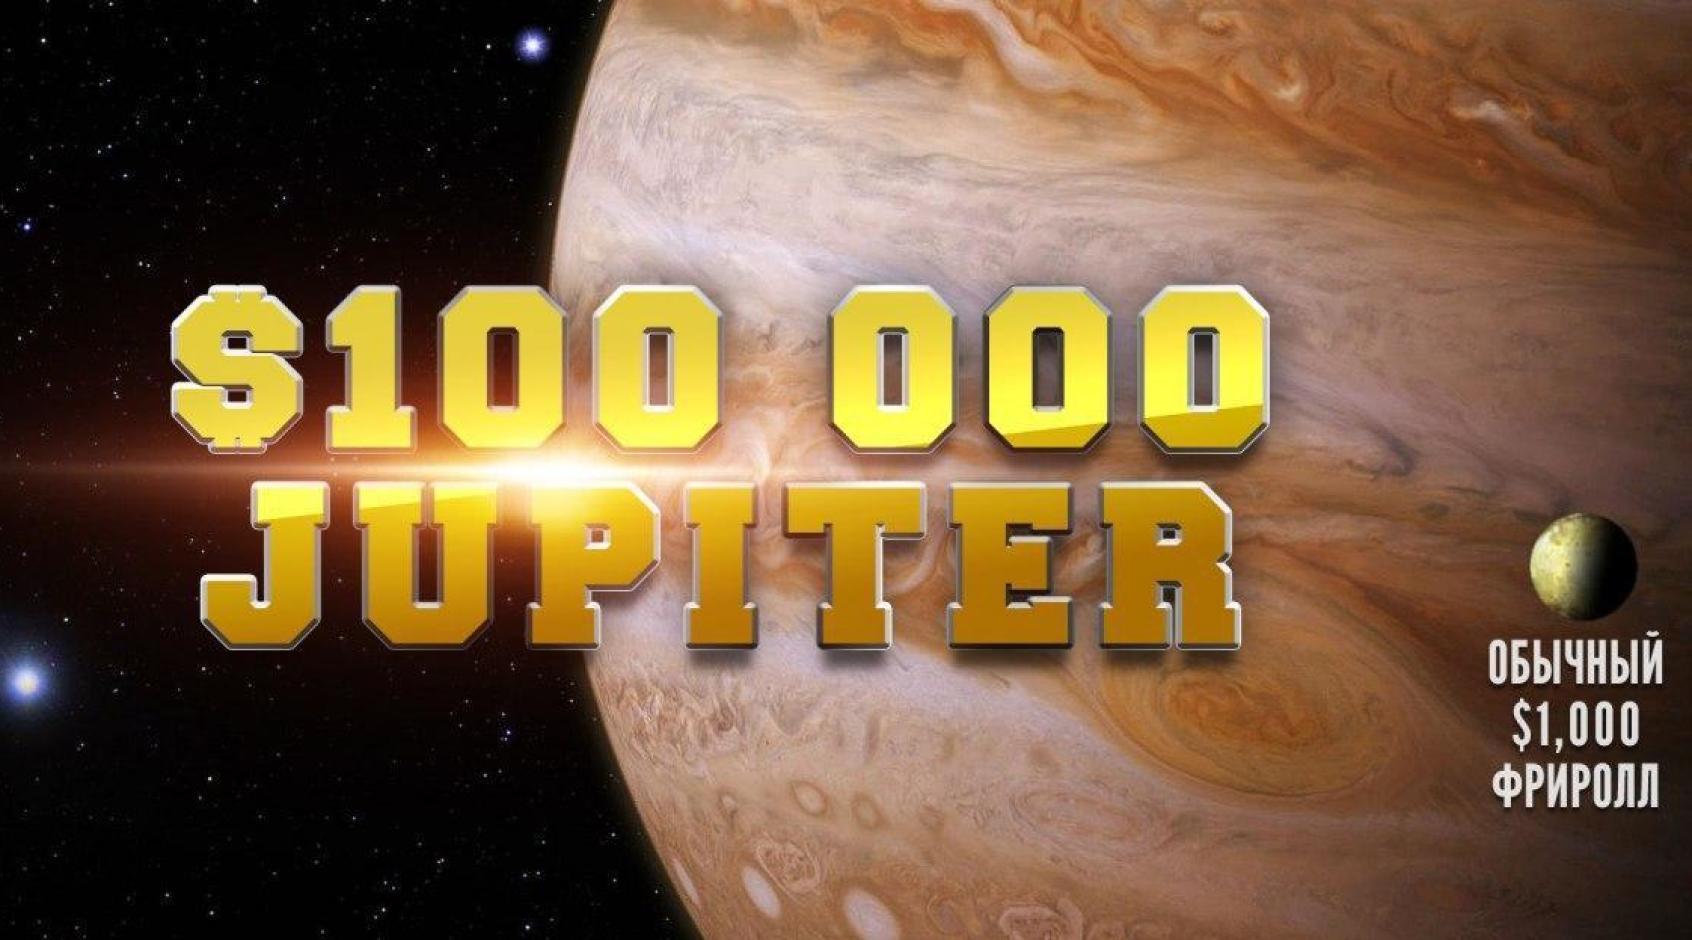 100 000 Jupiter - новый фазовый турнир на 888poker